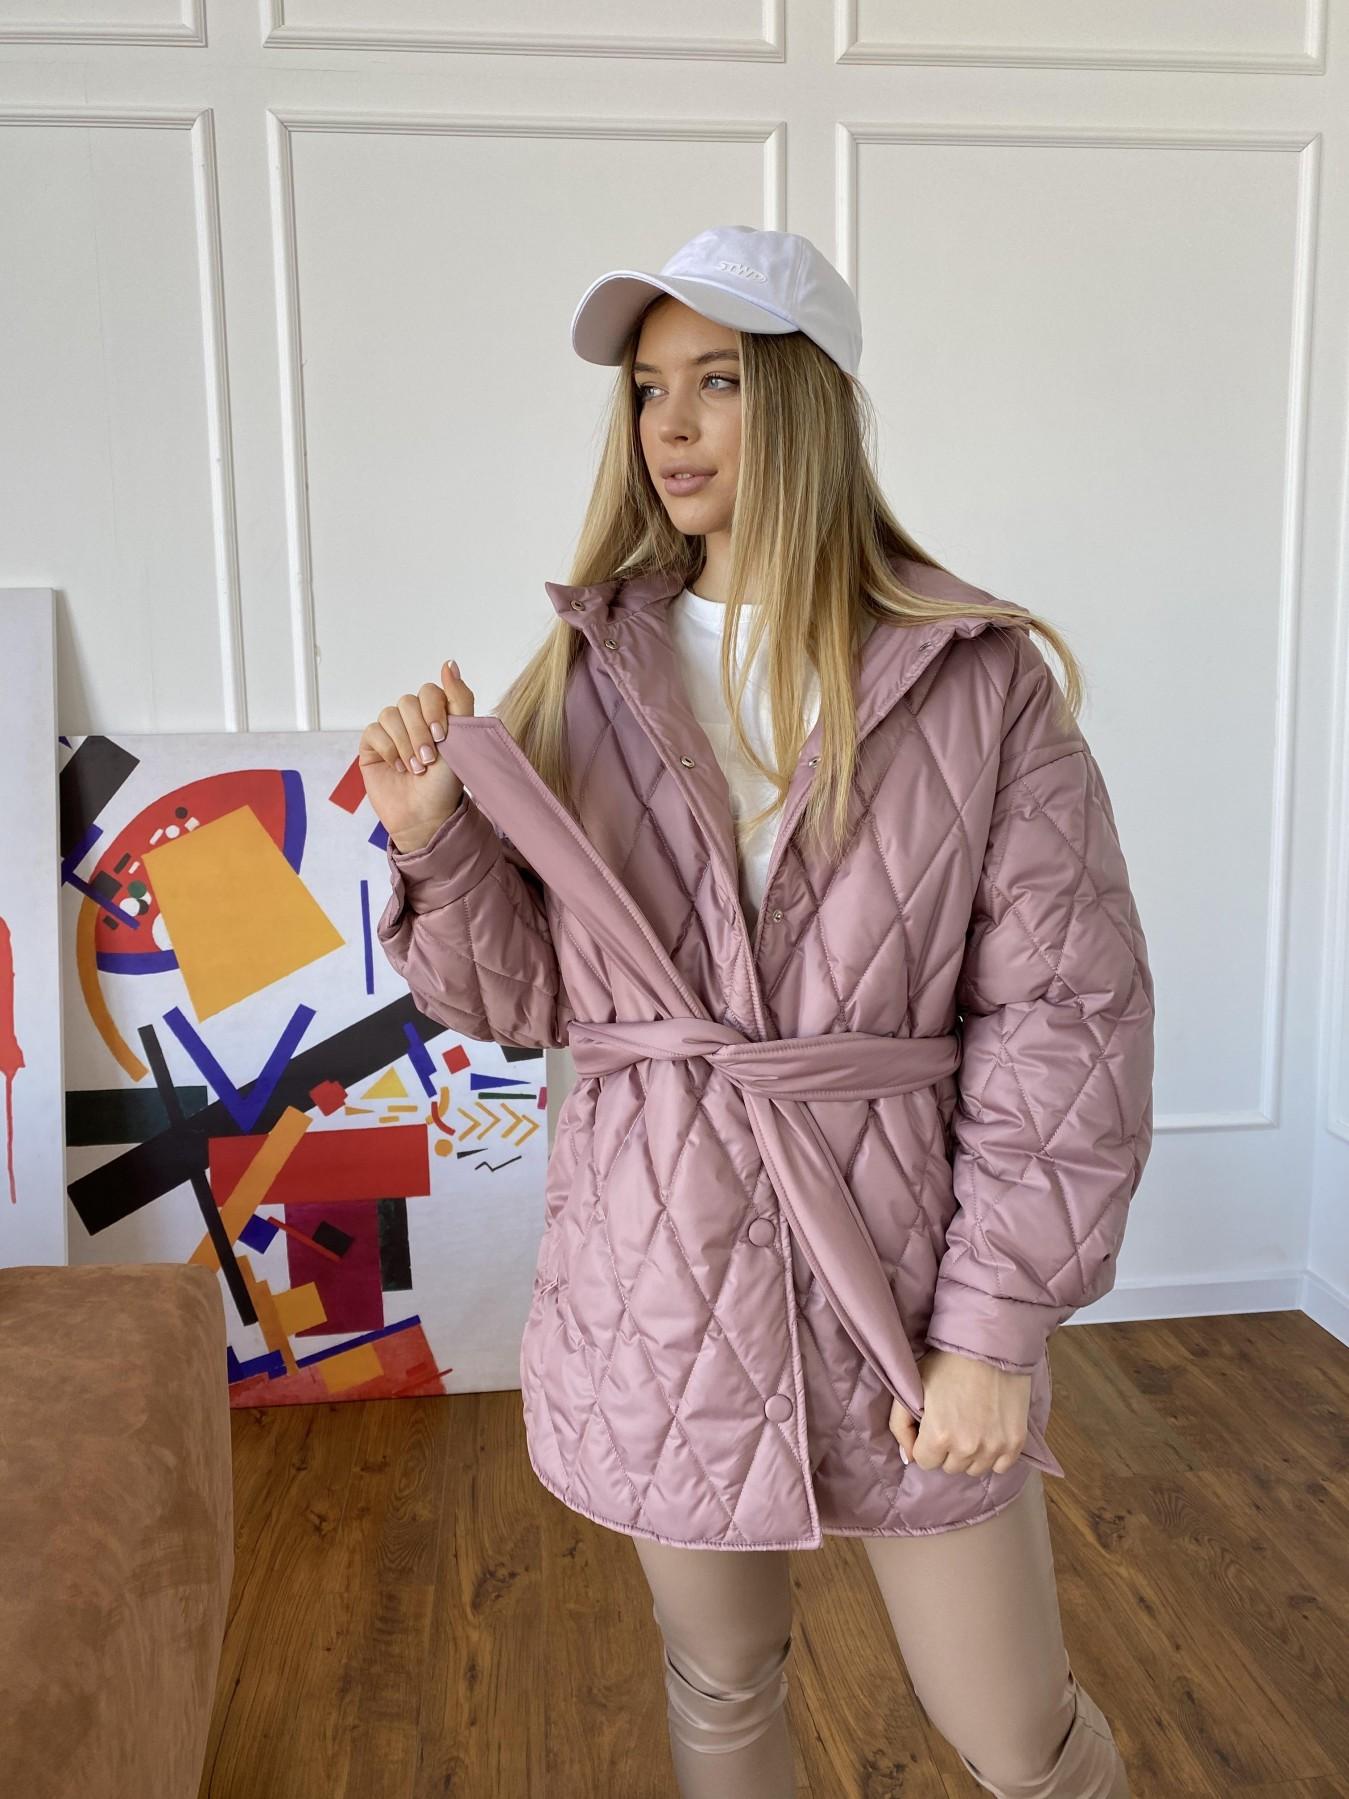 Пазл стеганая куртка из плащевки 10890 АРТ. 47400 Цвет: Пудра - фото 3, интернет магазин tm-modus.ru